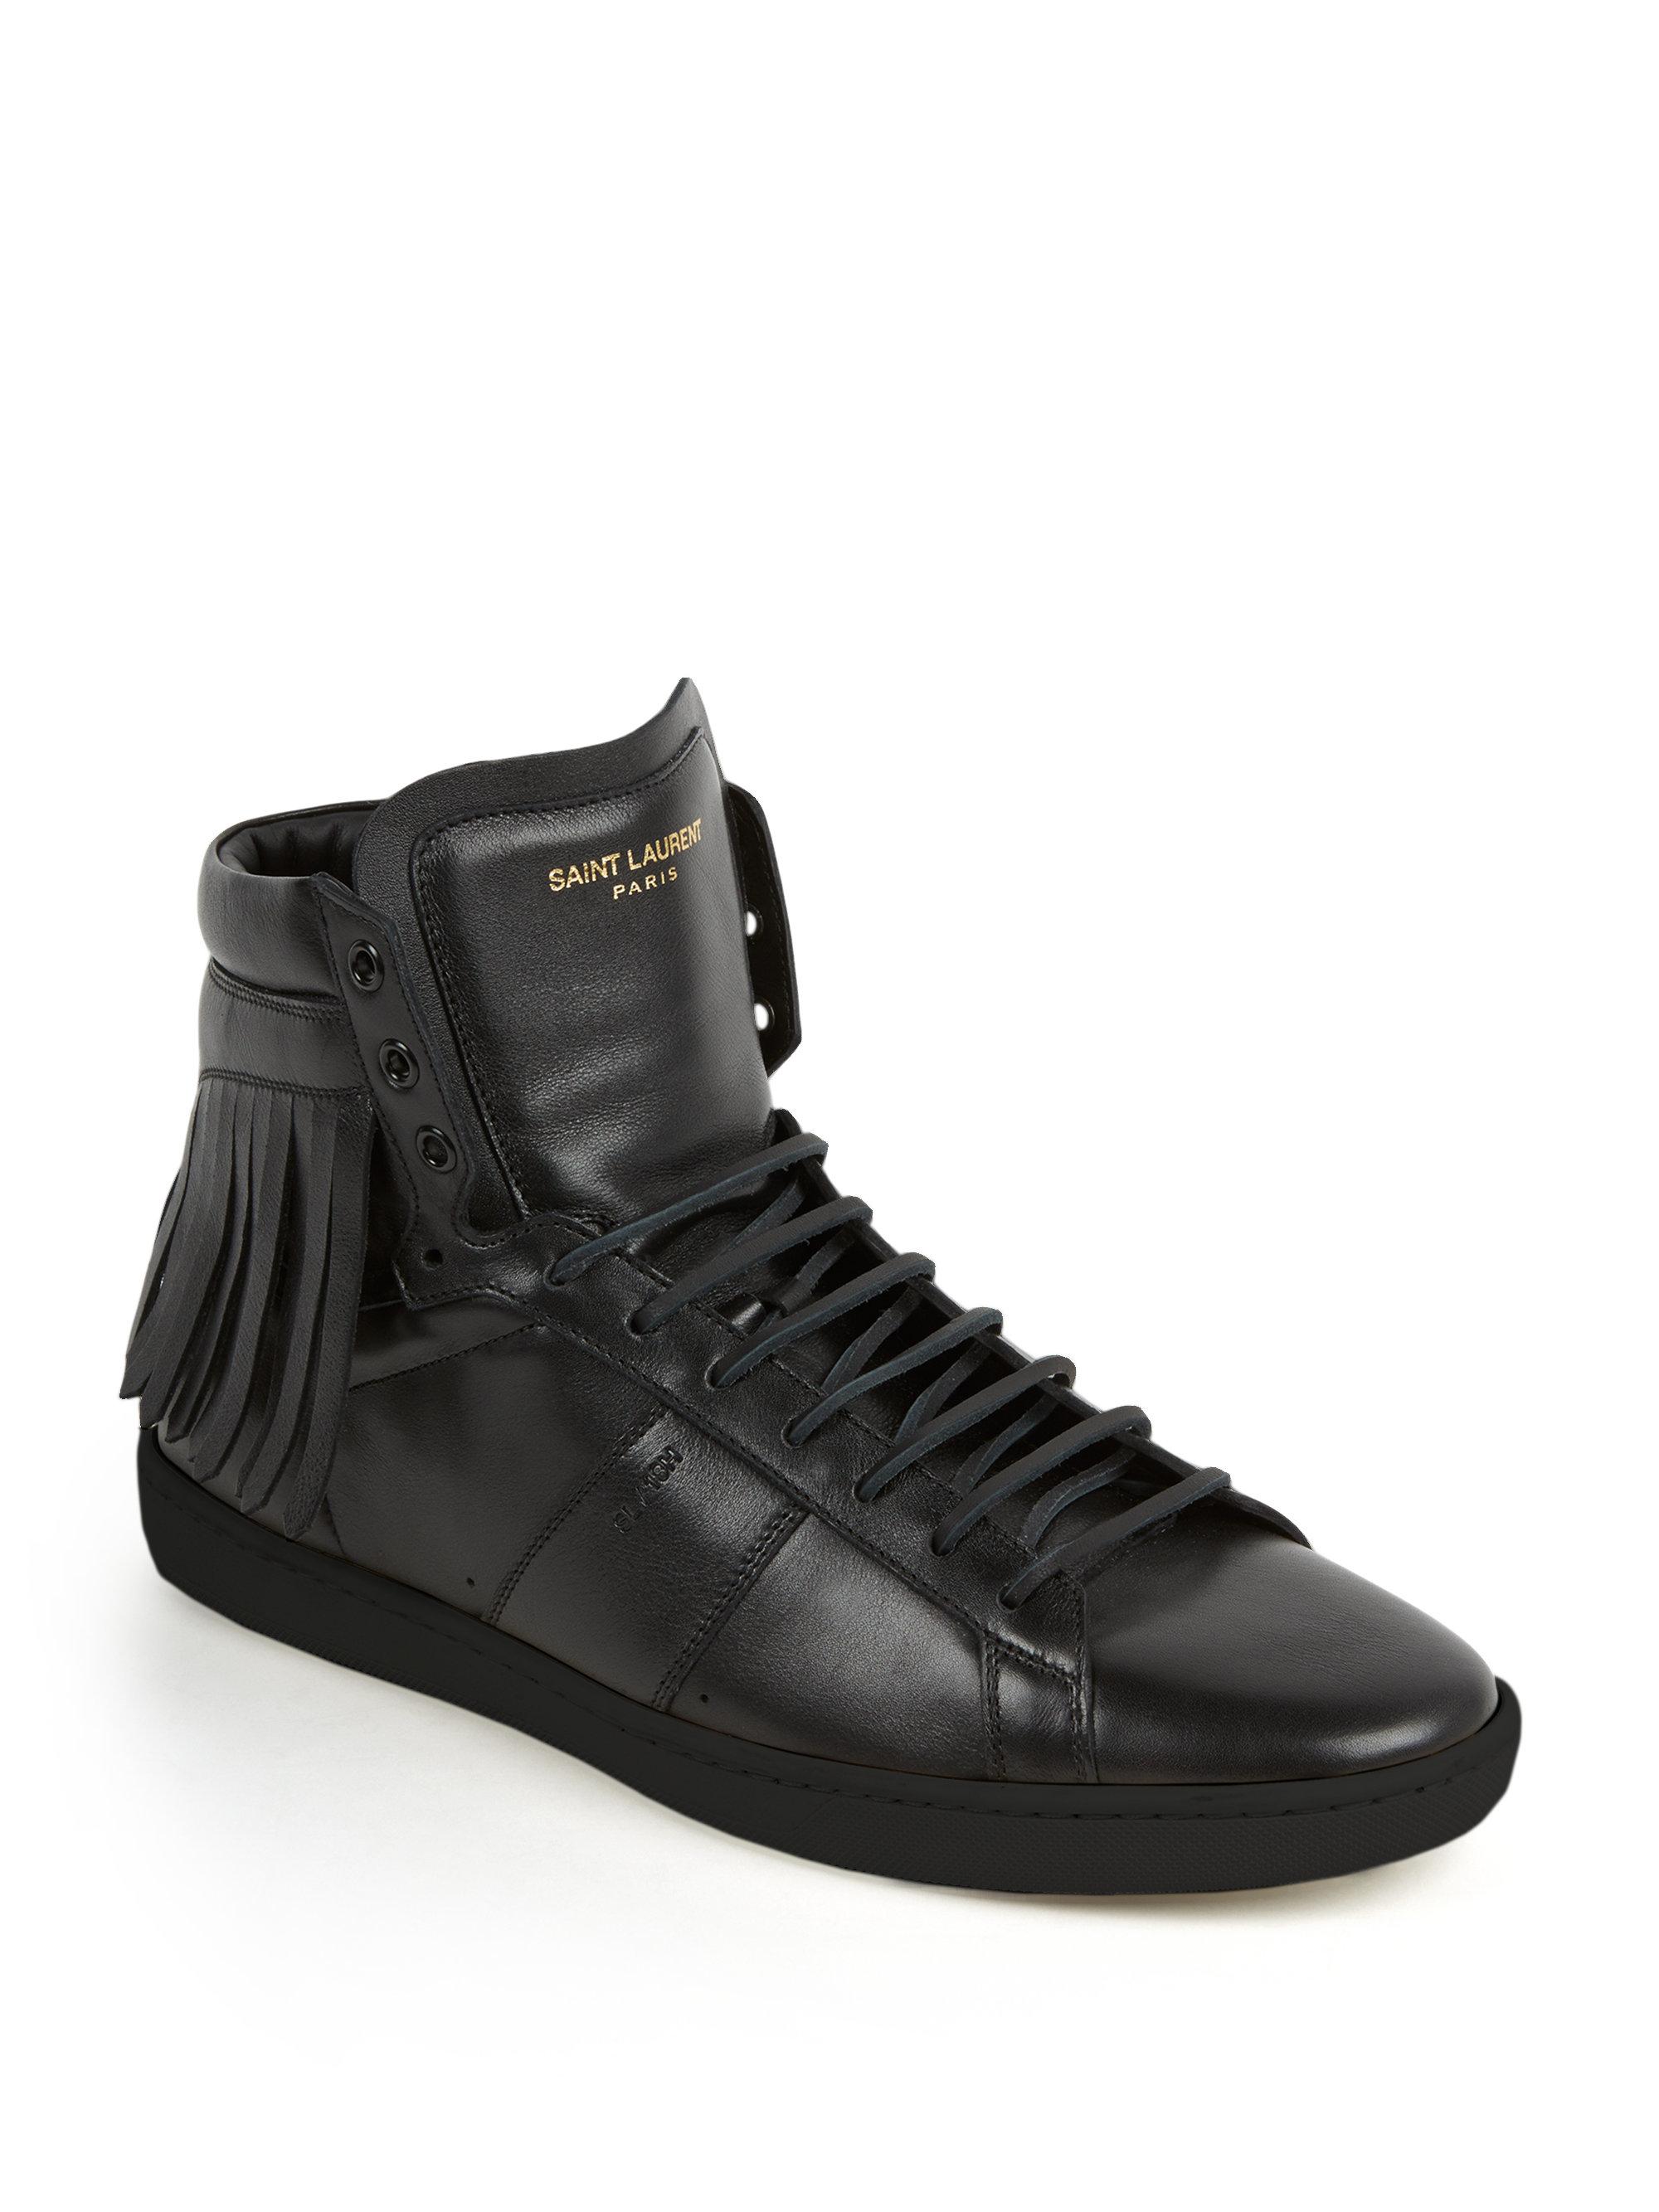 saint laurent fringed leather high top sneakers in black for men lyst. Black Bedroom Furniture Sets. Home Design Ideas